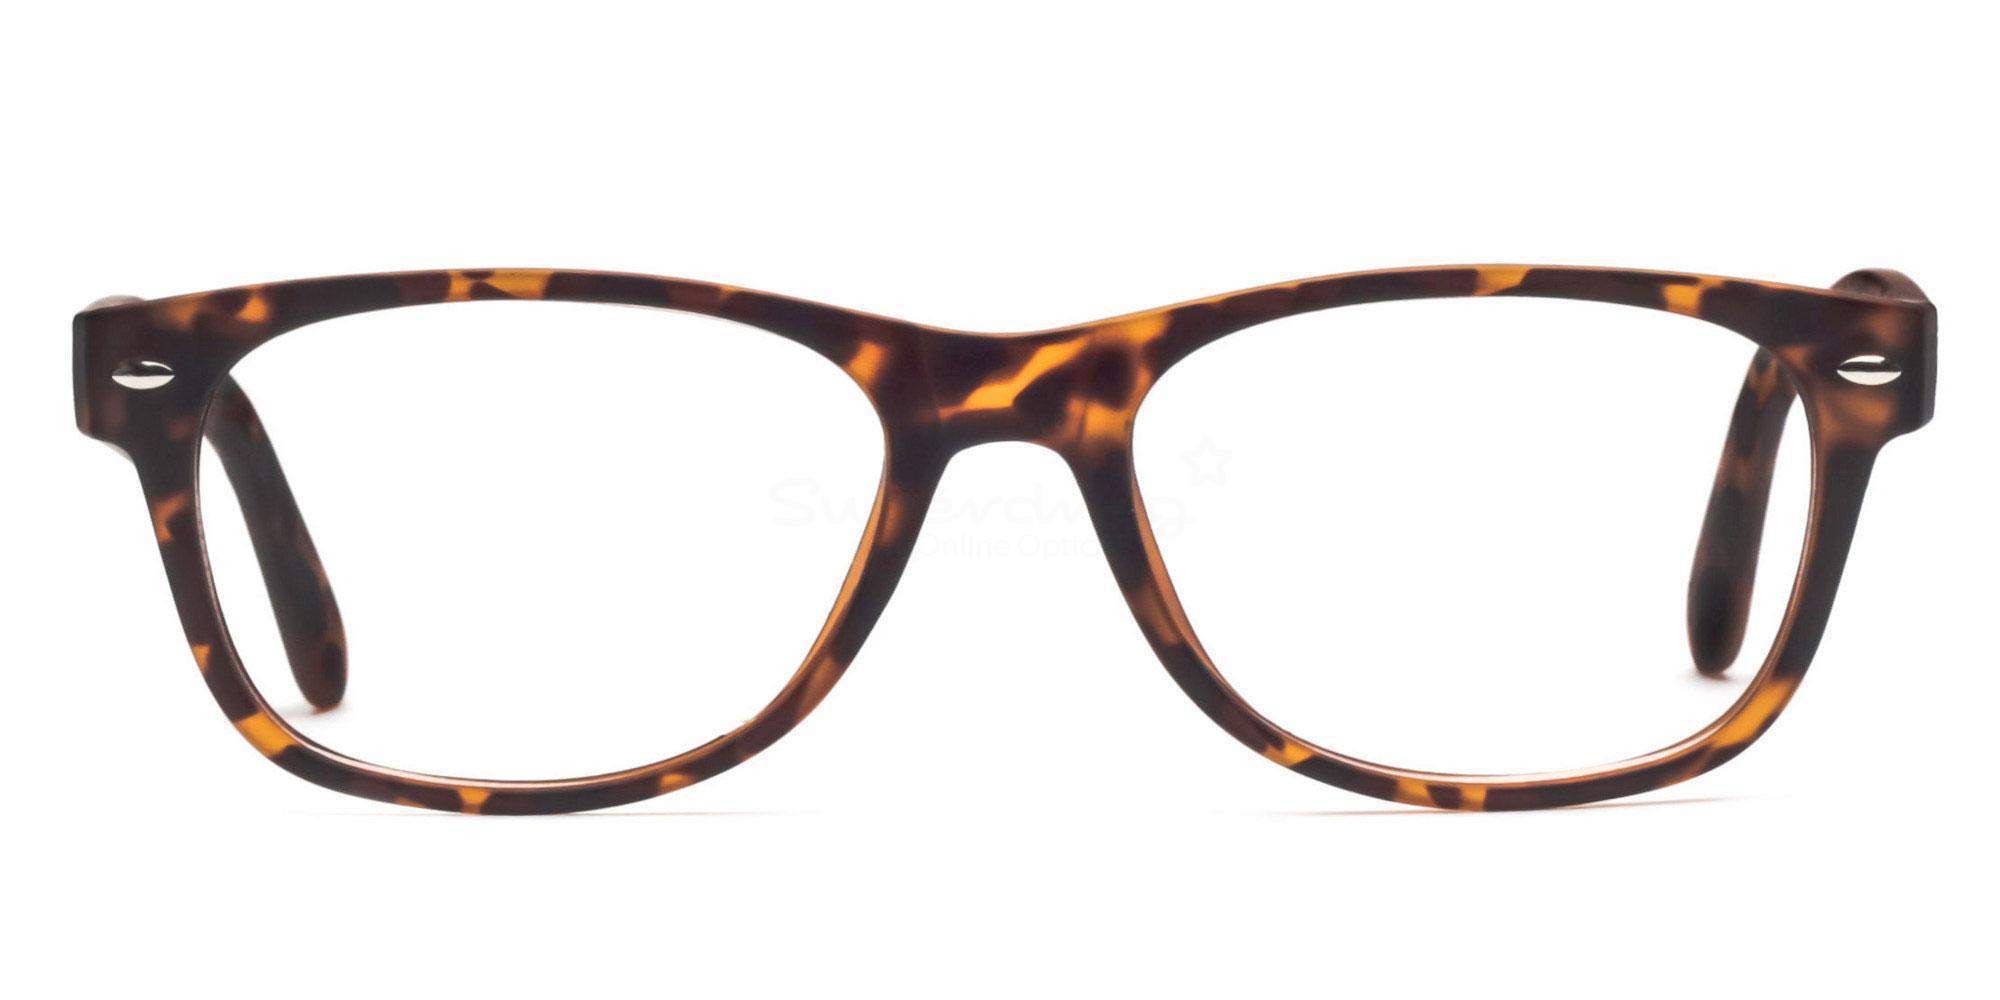 Tortoise 8122 - Tortoise Glasses, Helium